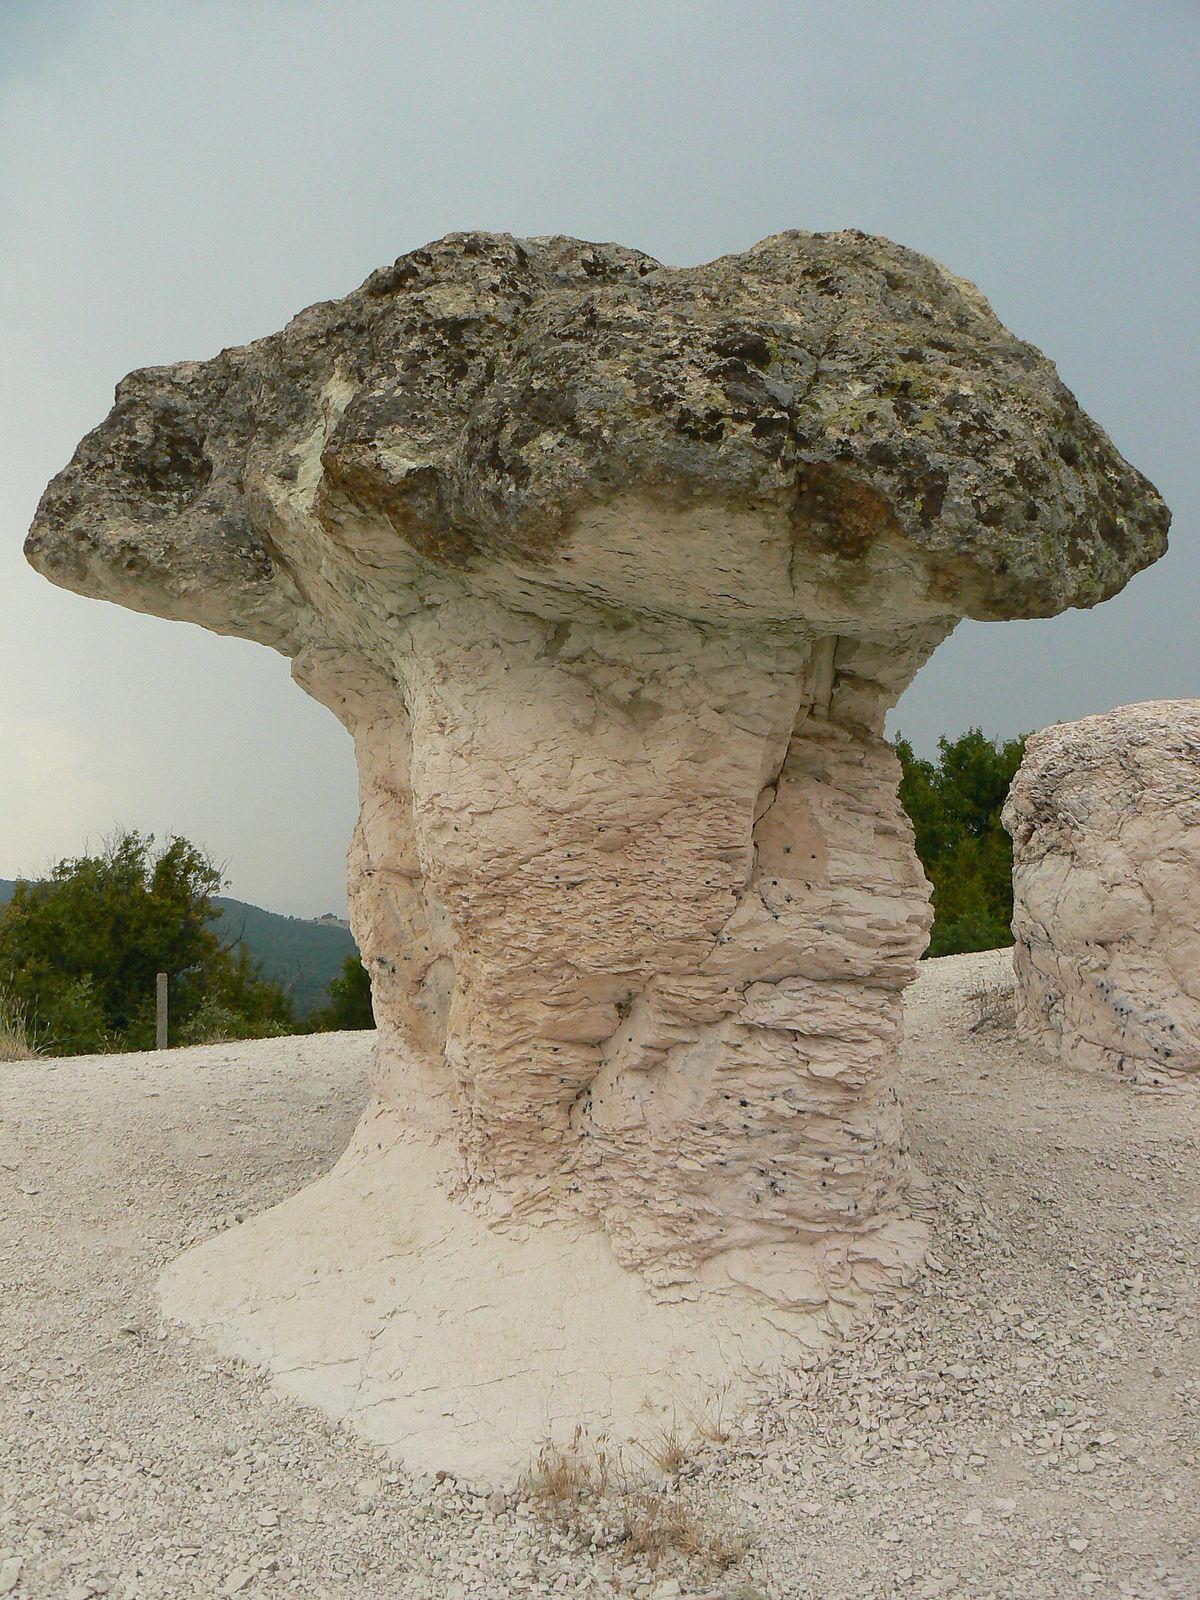 The Stone Mushrooms  Wikipedia